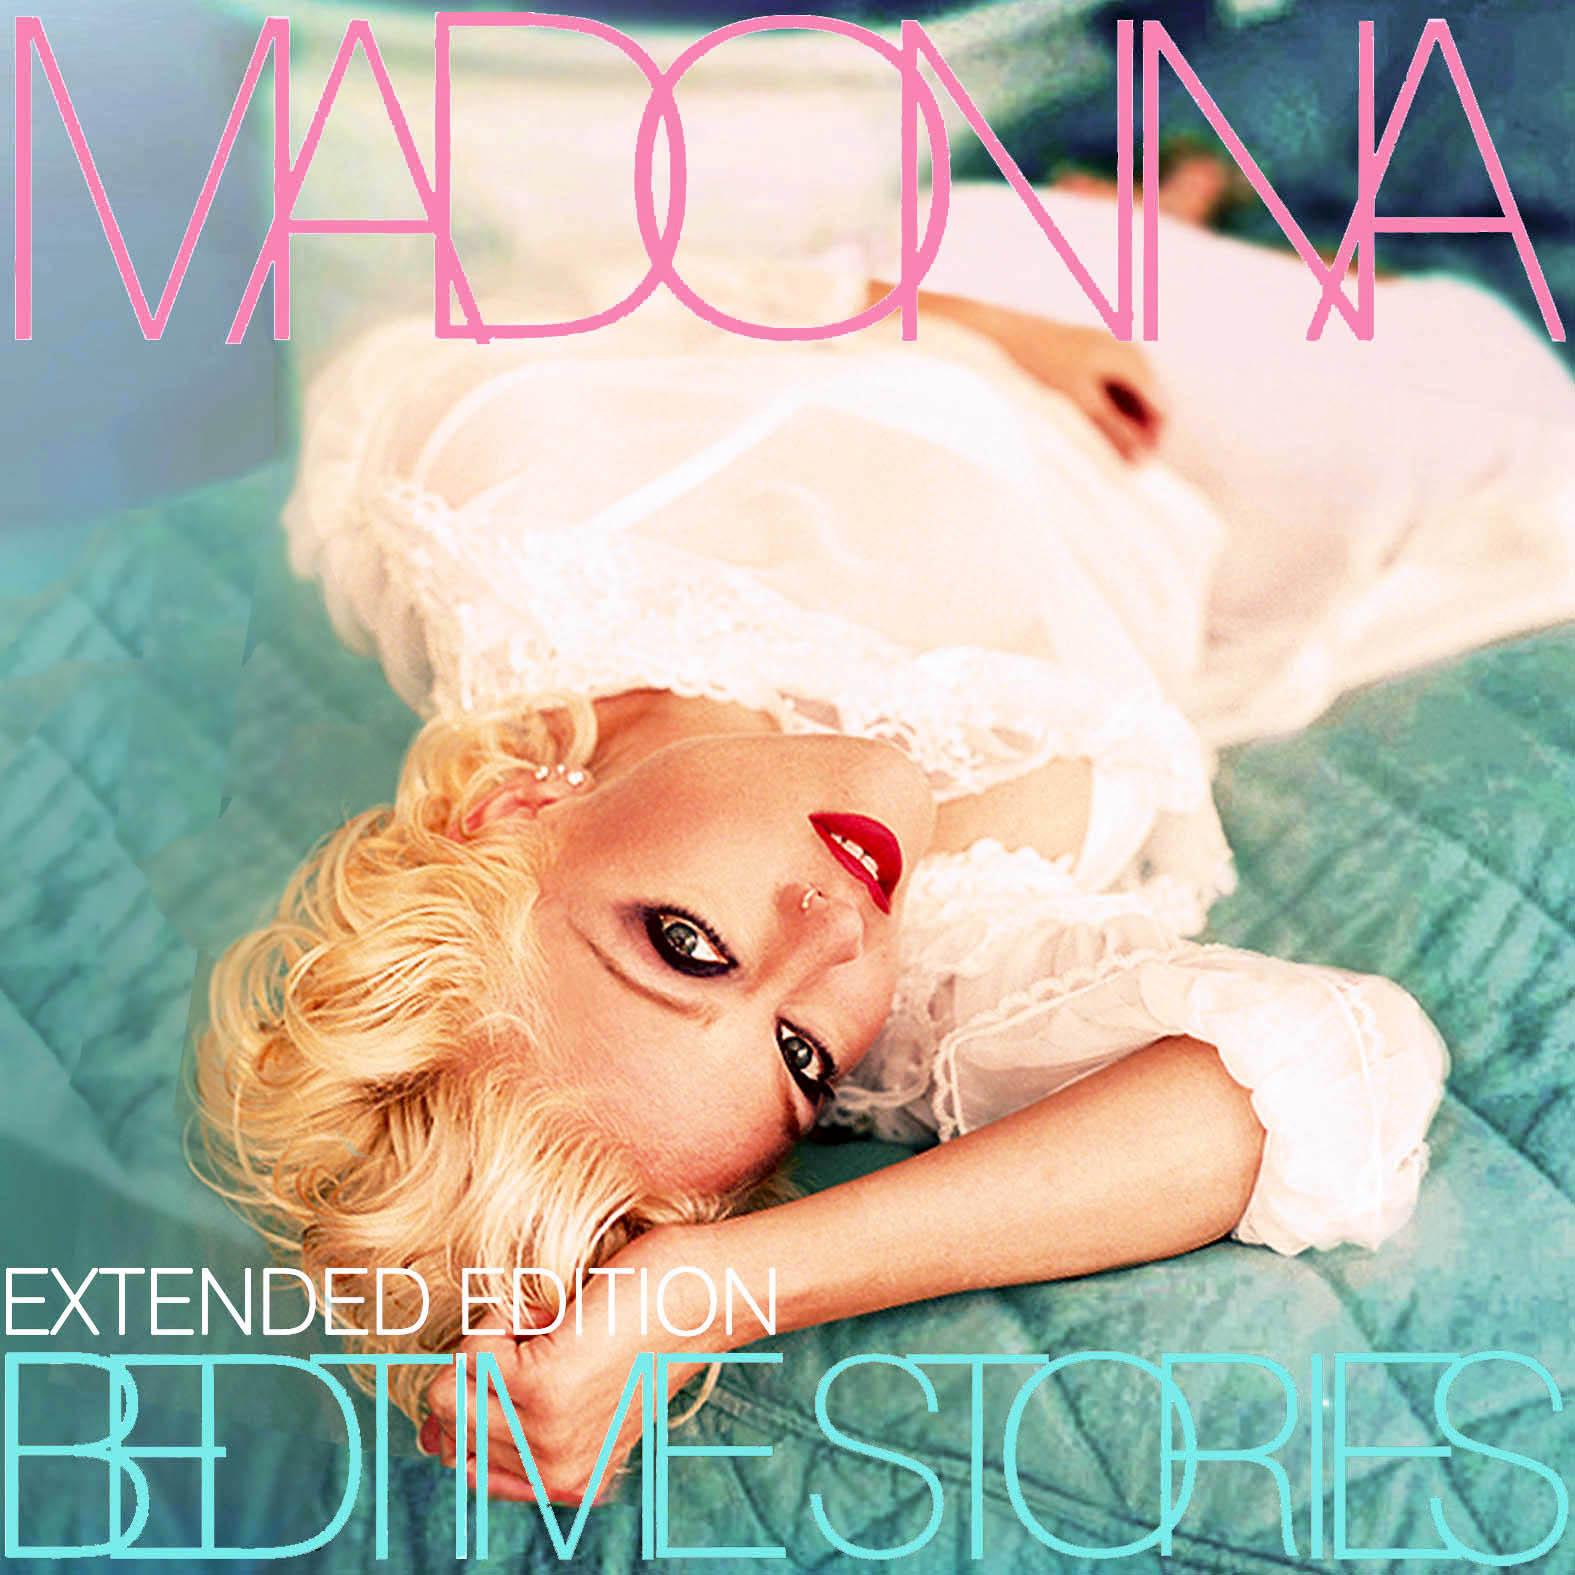 madonna-albom-erotika-fotografii